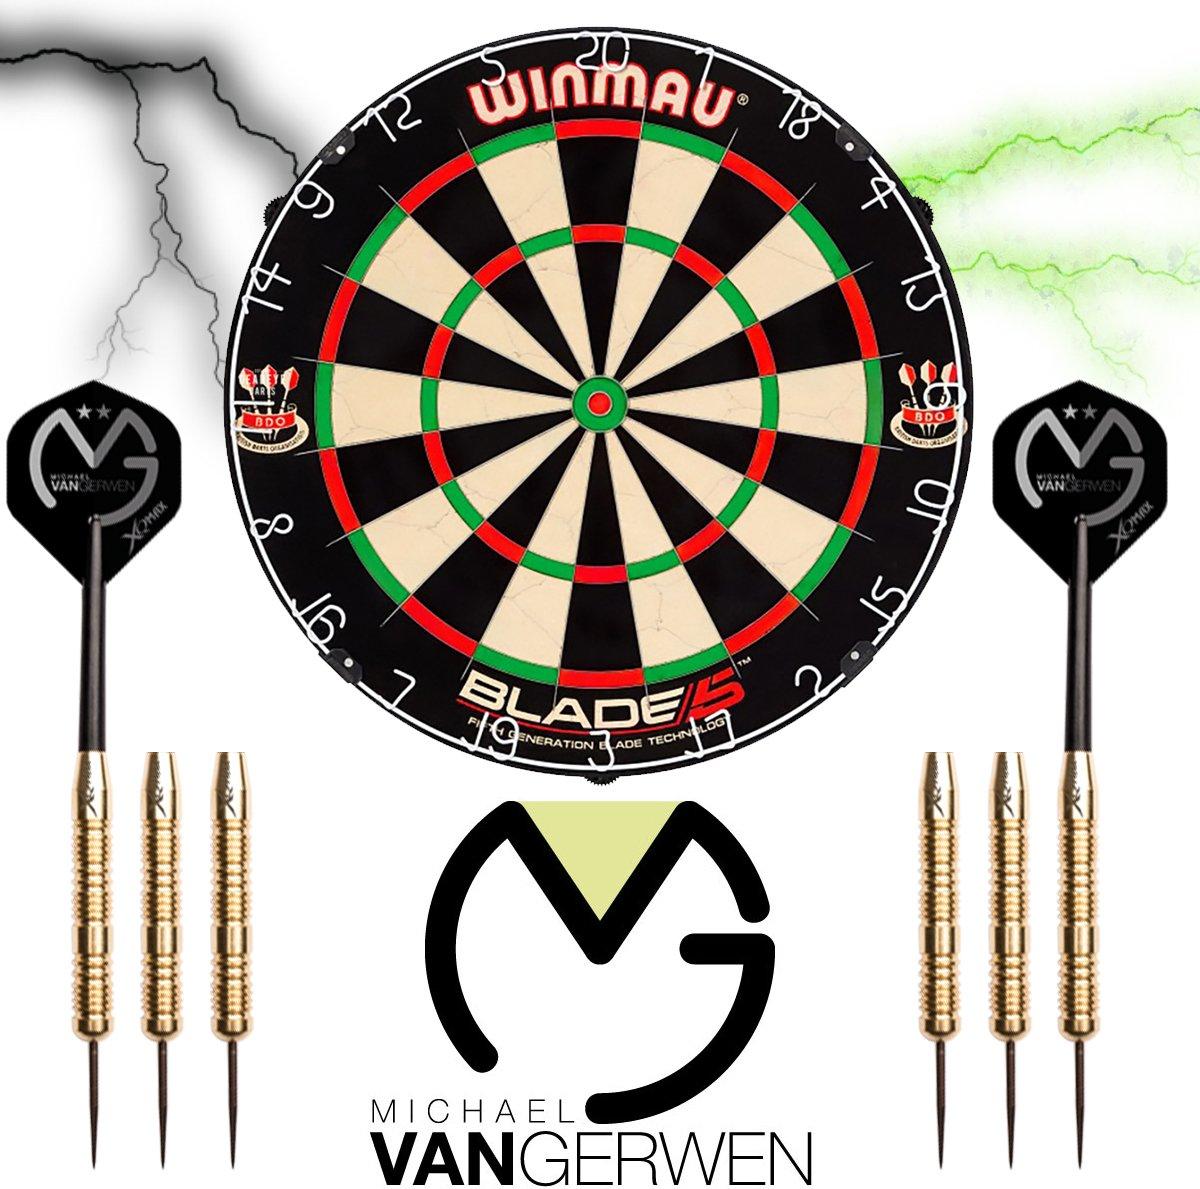 Winmau set - Blade 5 - dartbord - plus 2 sets - Michael van Gerwen dartpijlen - dartpijlen kopen